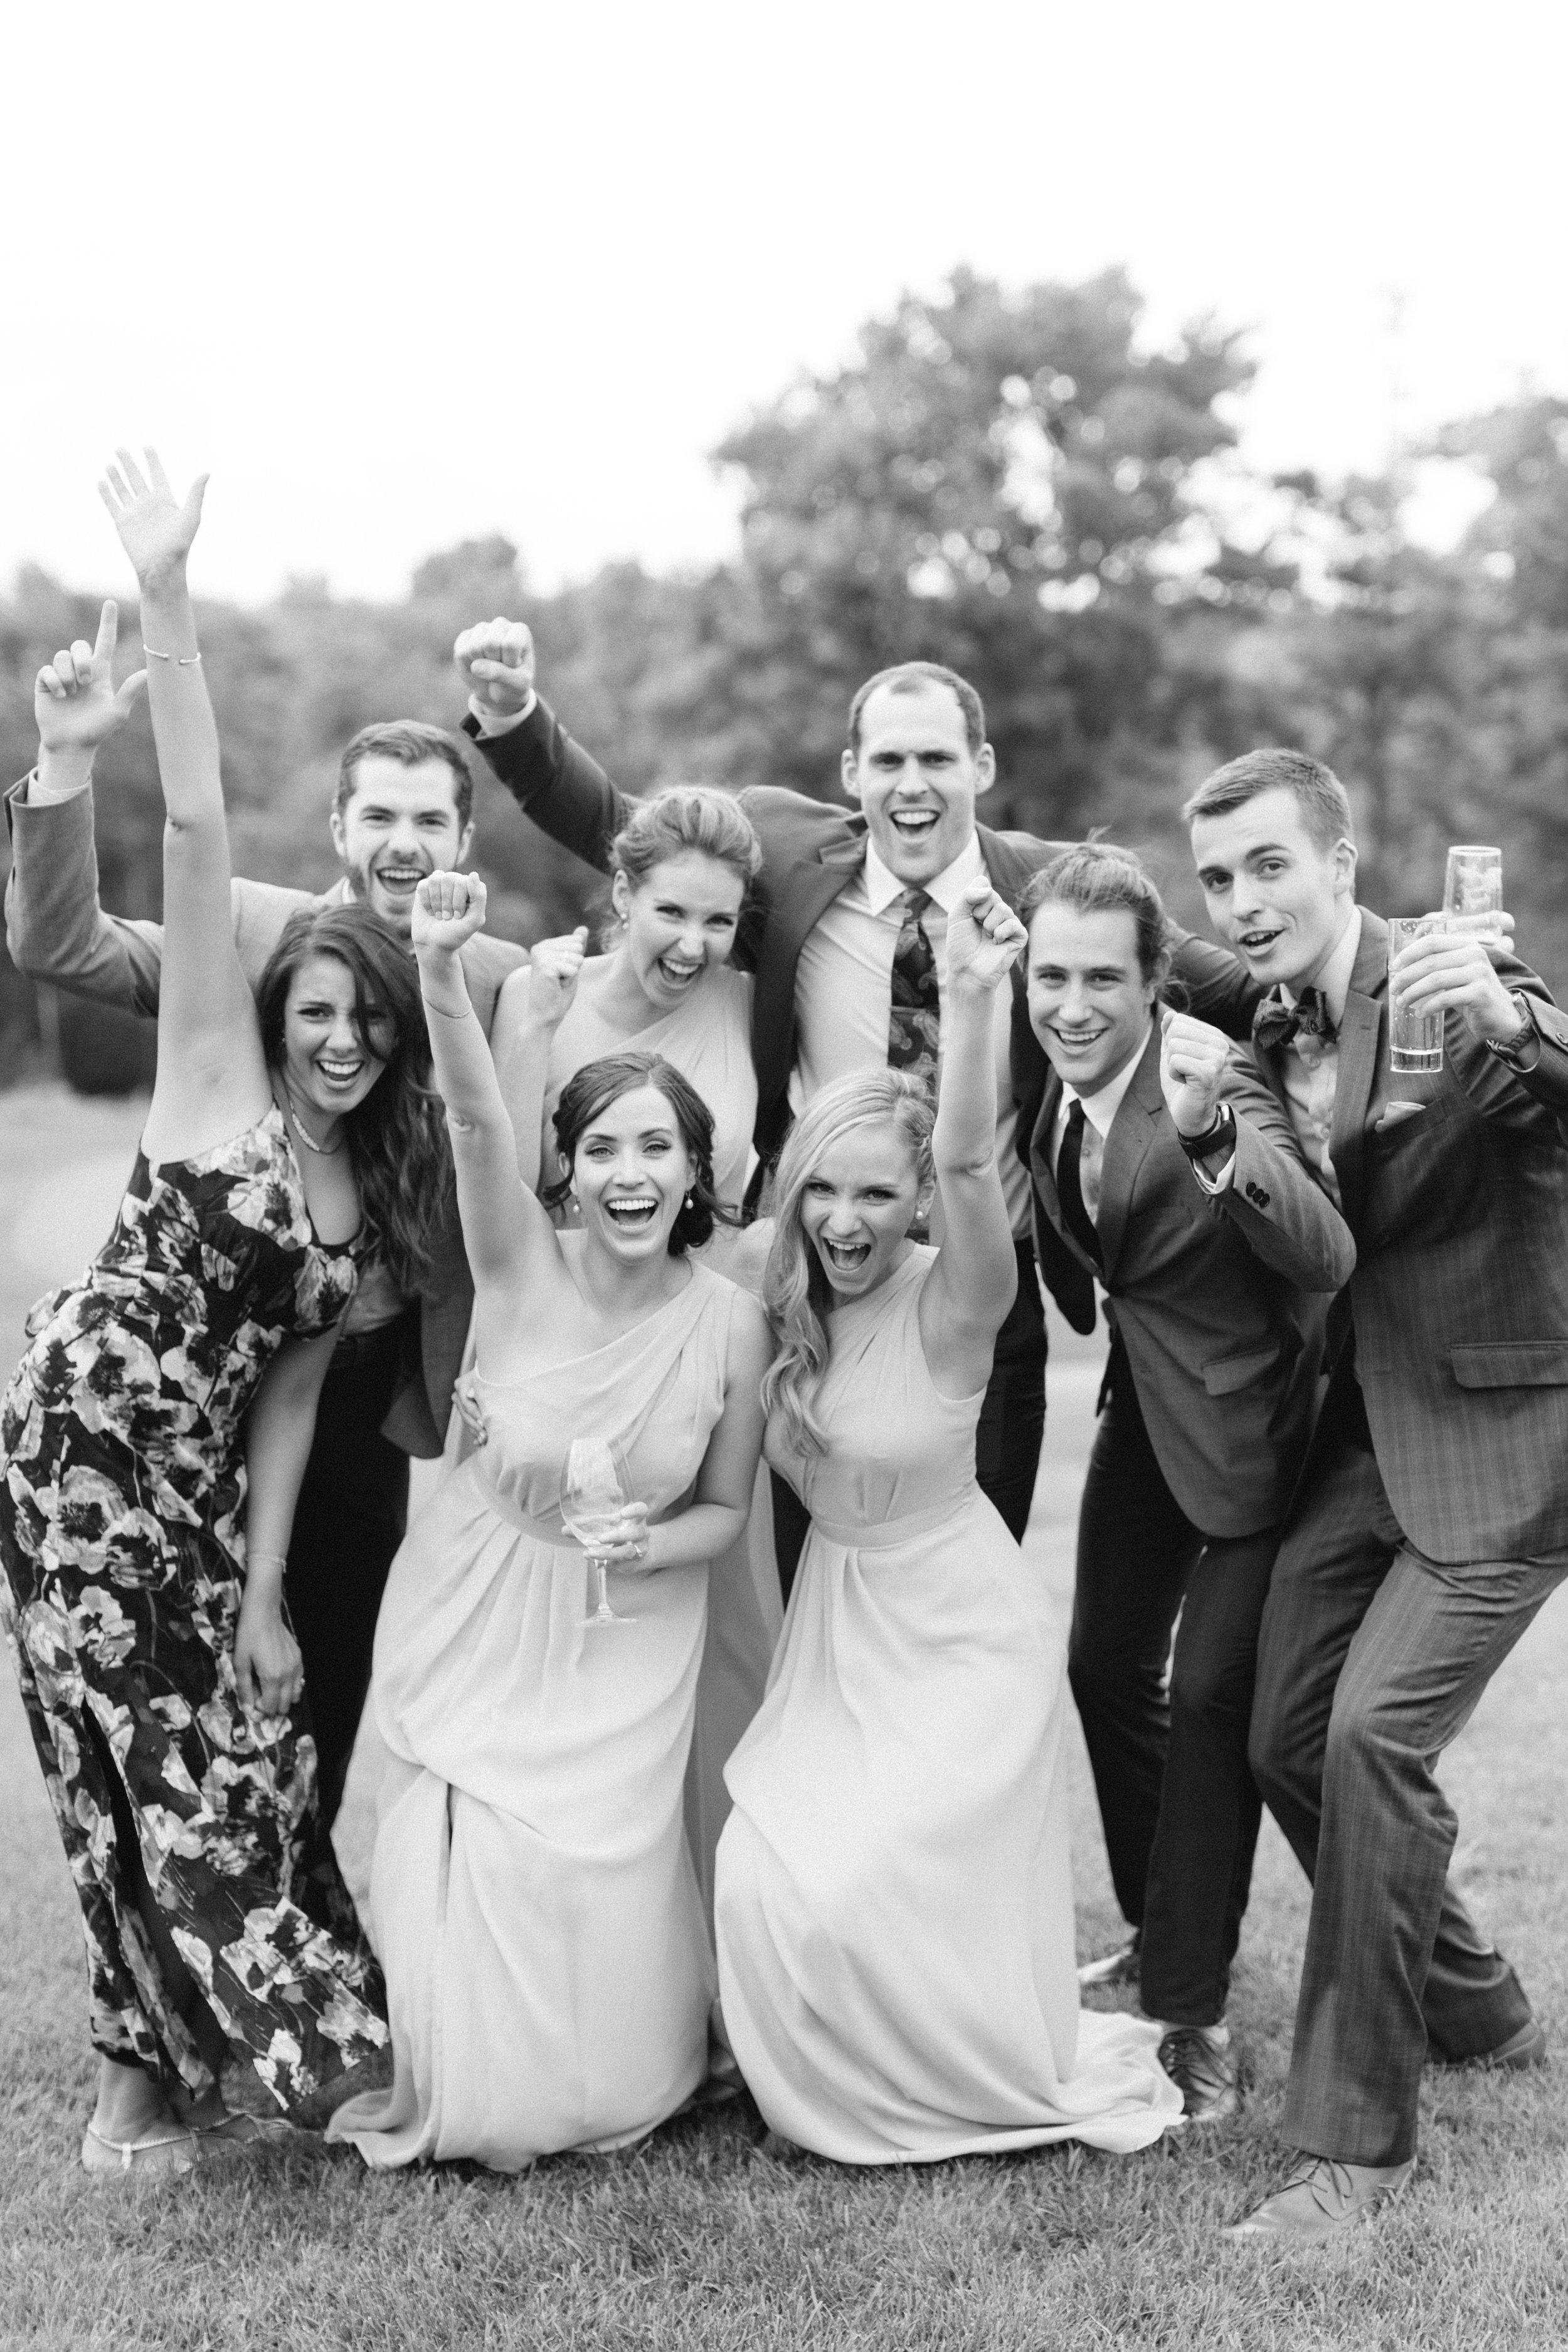 london-hunt-club-toronto-wedding-photographer-bright-richelle-hunter-jewish-ceremony-jessica-shemer-722.jpg